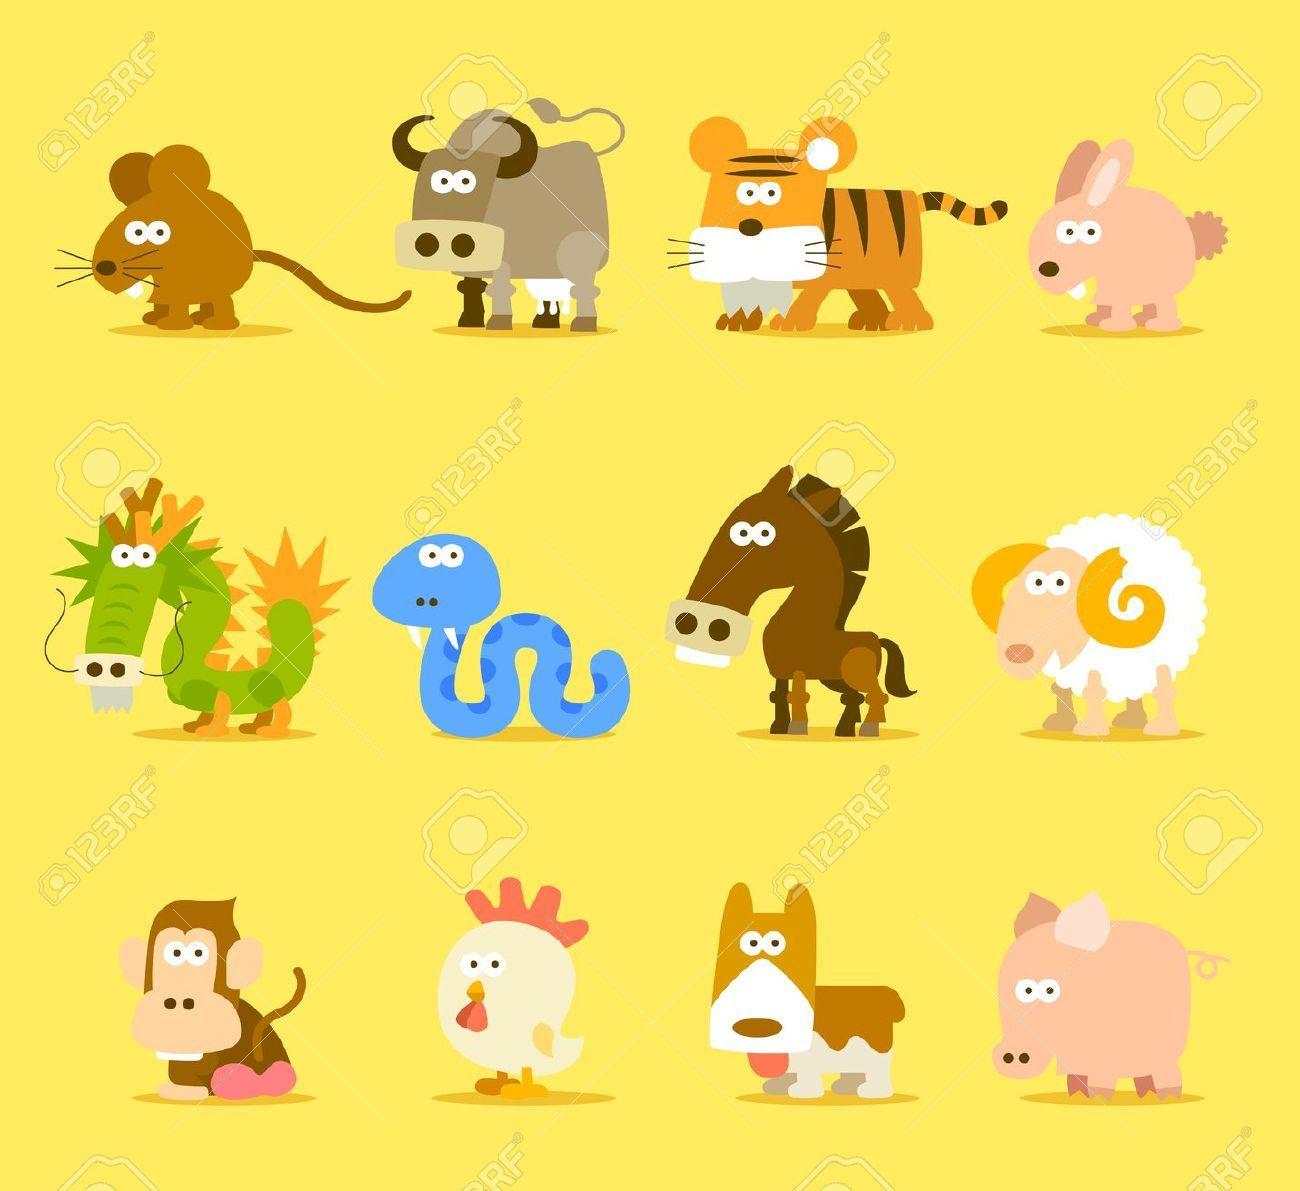 Chinese Zodiac Cartoon Animals Google Search Animal Icon Baby Art Chinese Zodiac